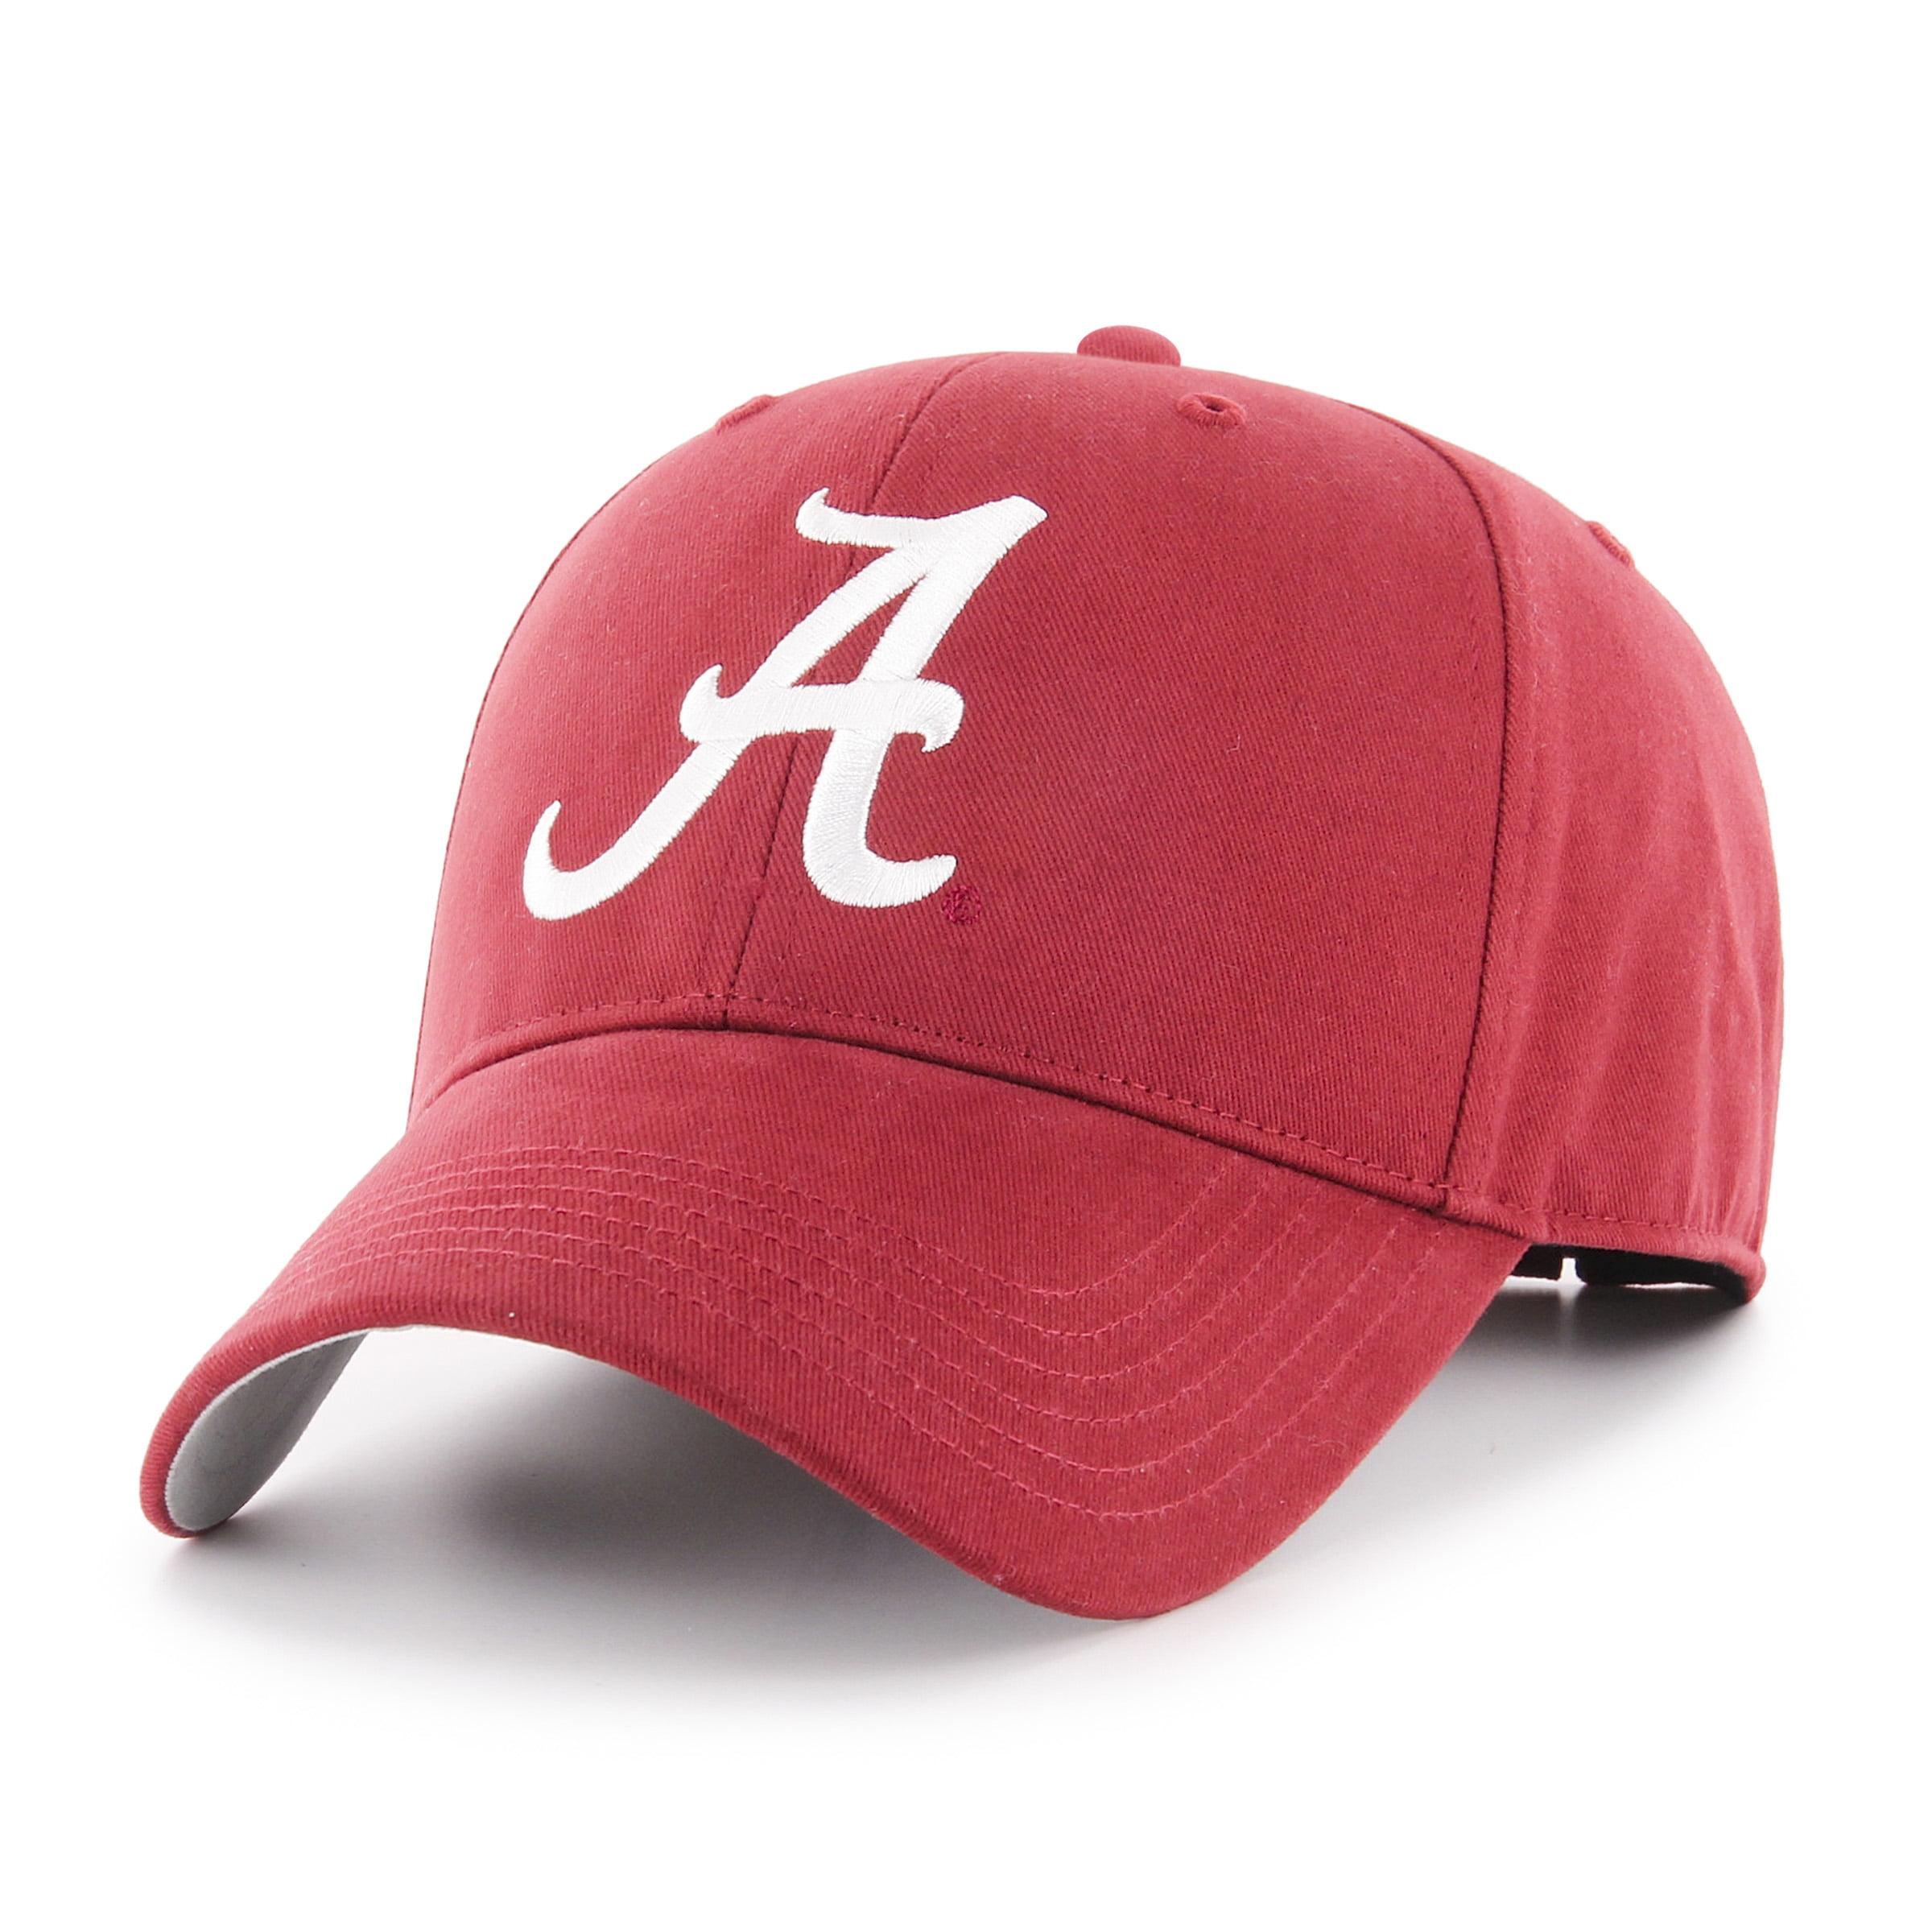 Mossy Oak Indiana University Hoosiers White Camo College Team Strap Back Dad Hat Cap